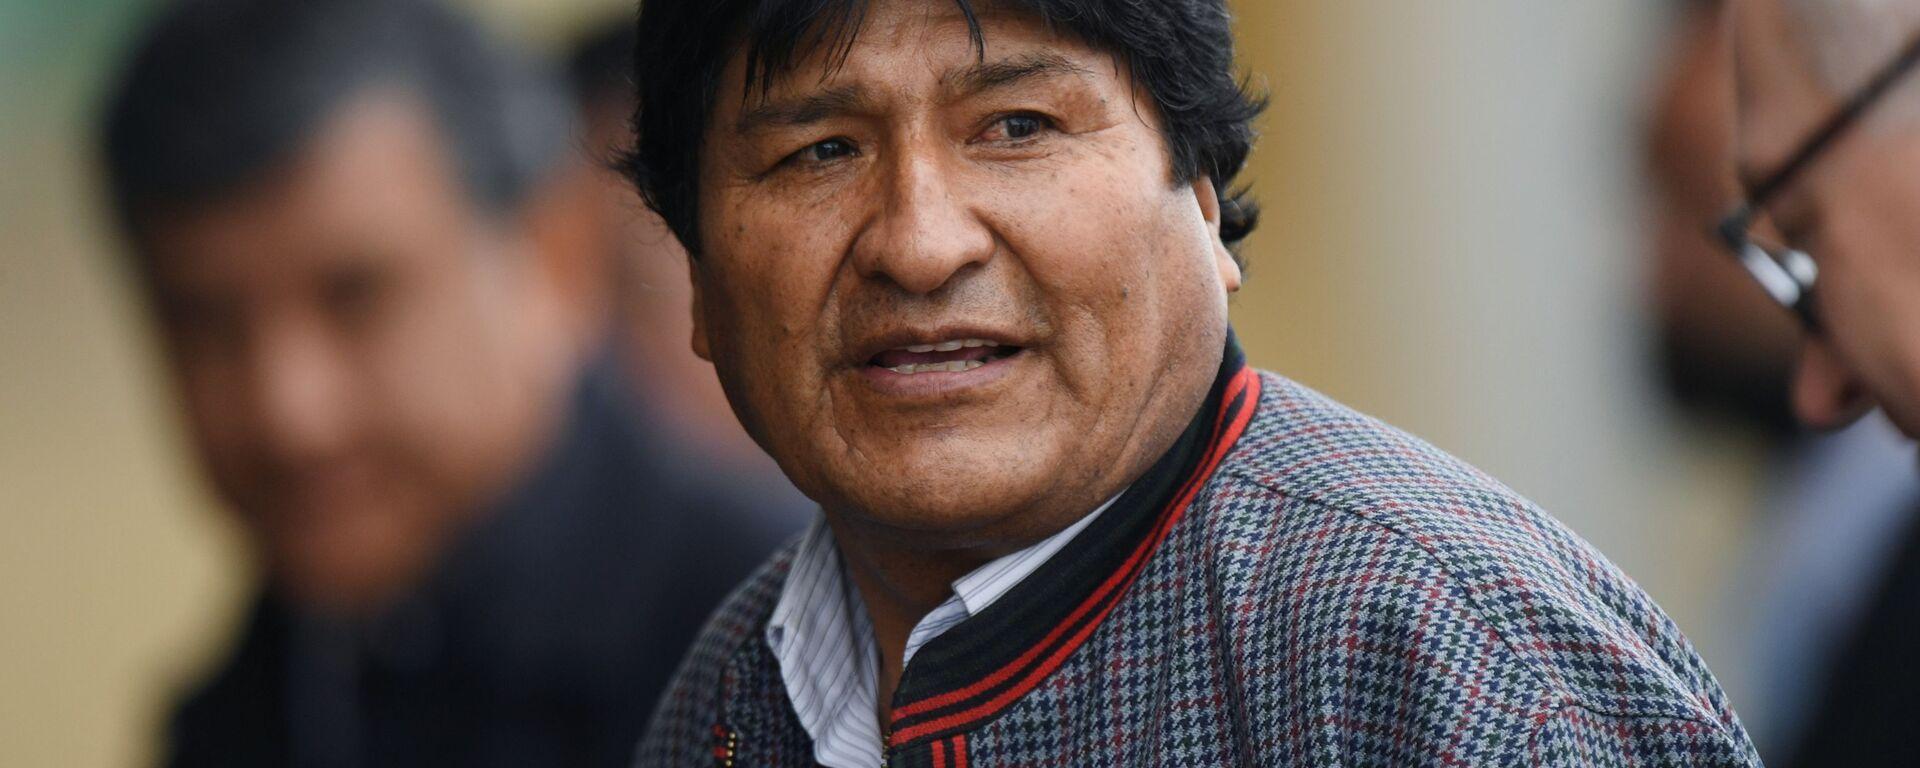 Evo Morales, presidente boliviano  - Sputnik Mundo, 1920, 17.09.2021